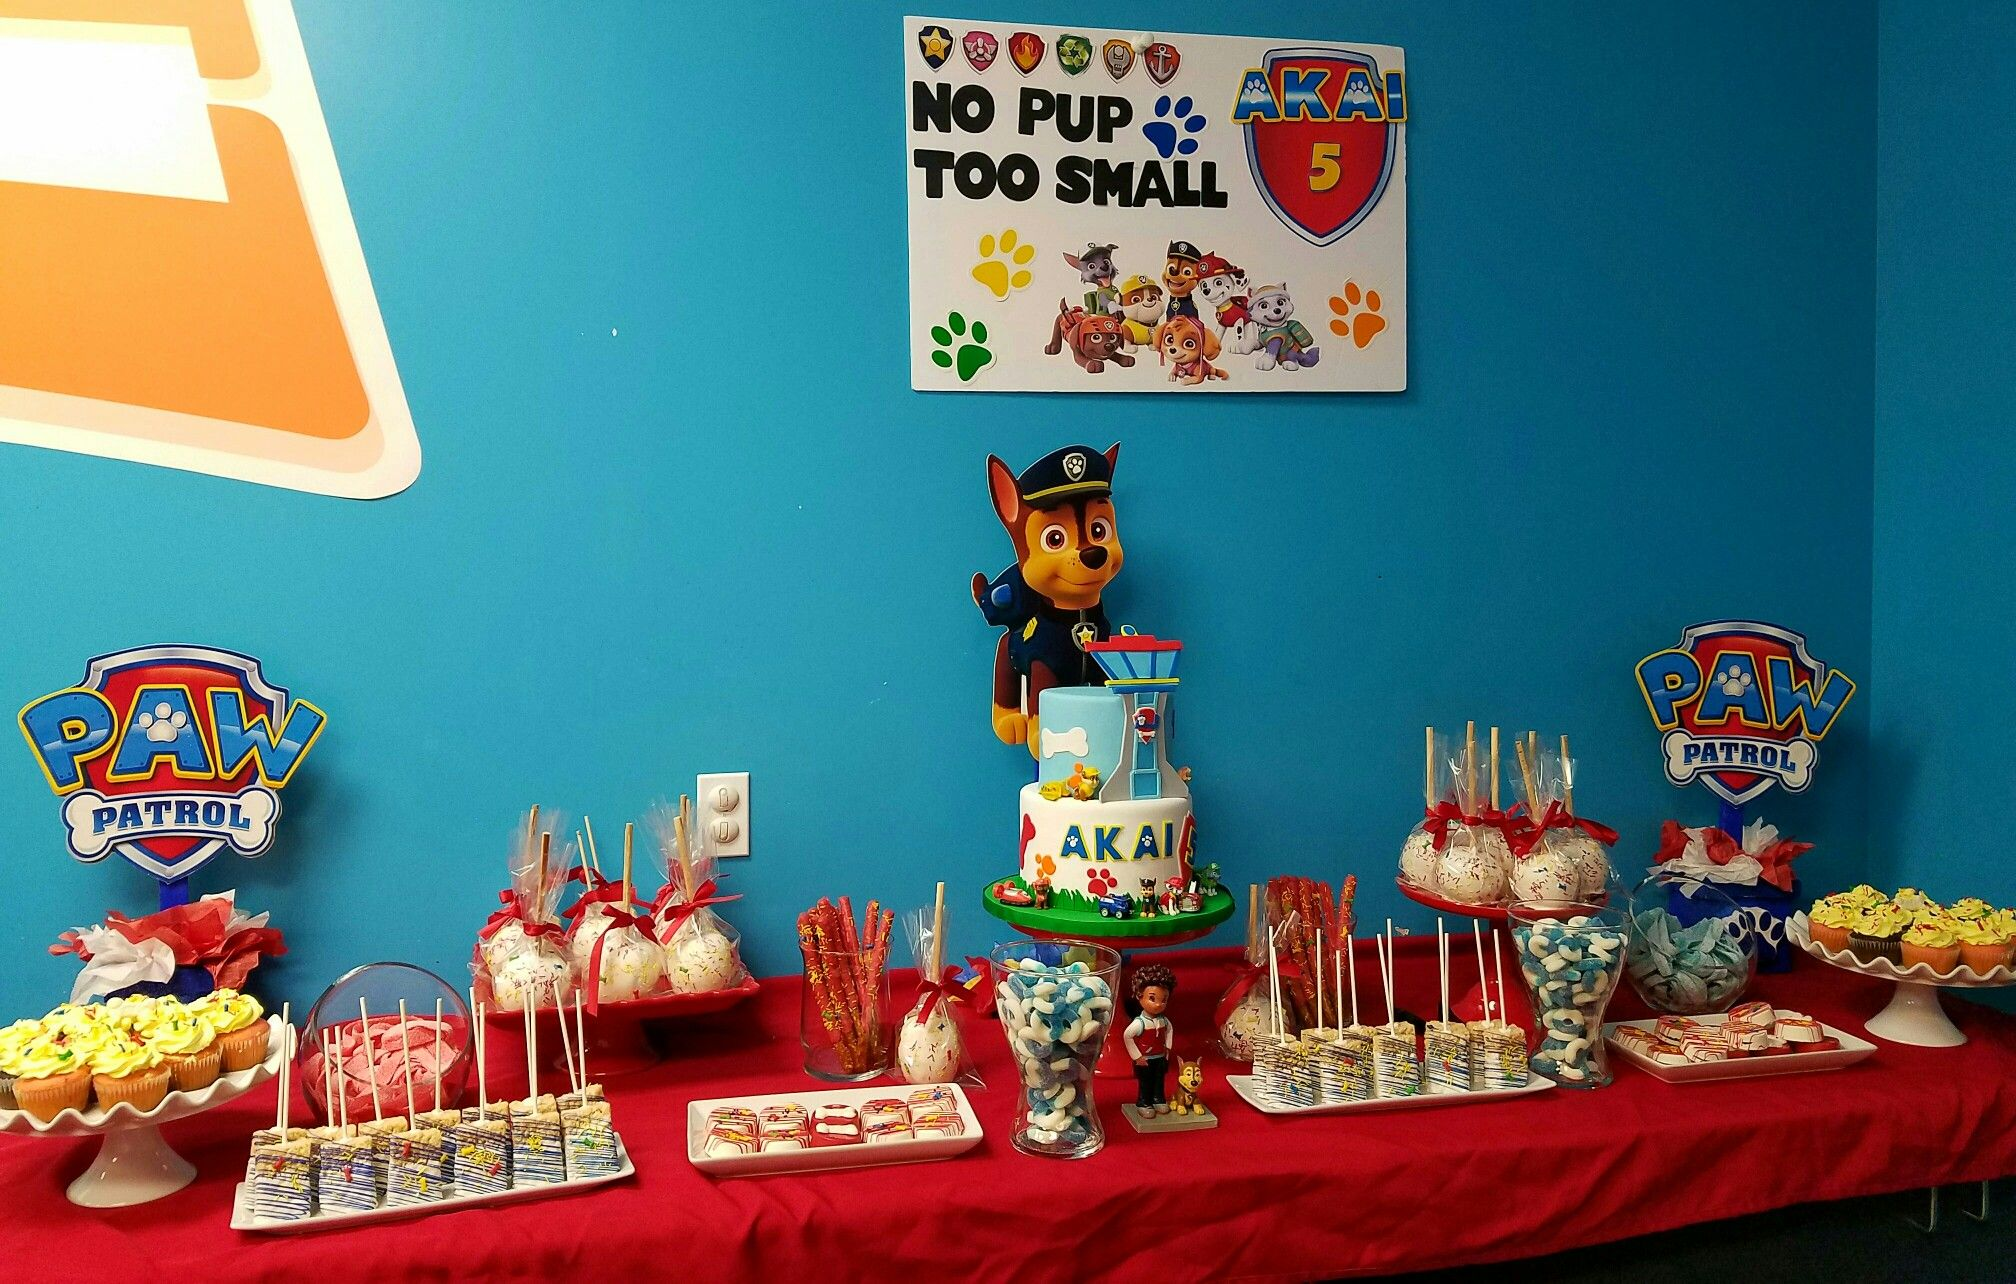 Paw Patrol Candy Table Birthday Candy Table Paw Patrol Birthday Dessert Table